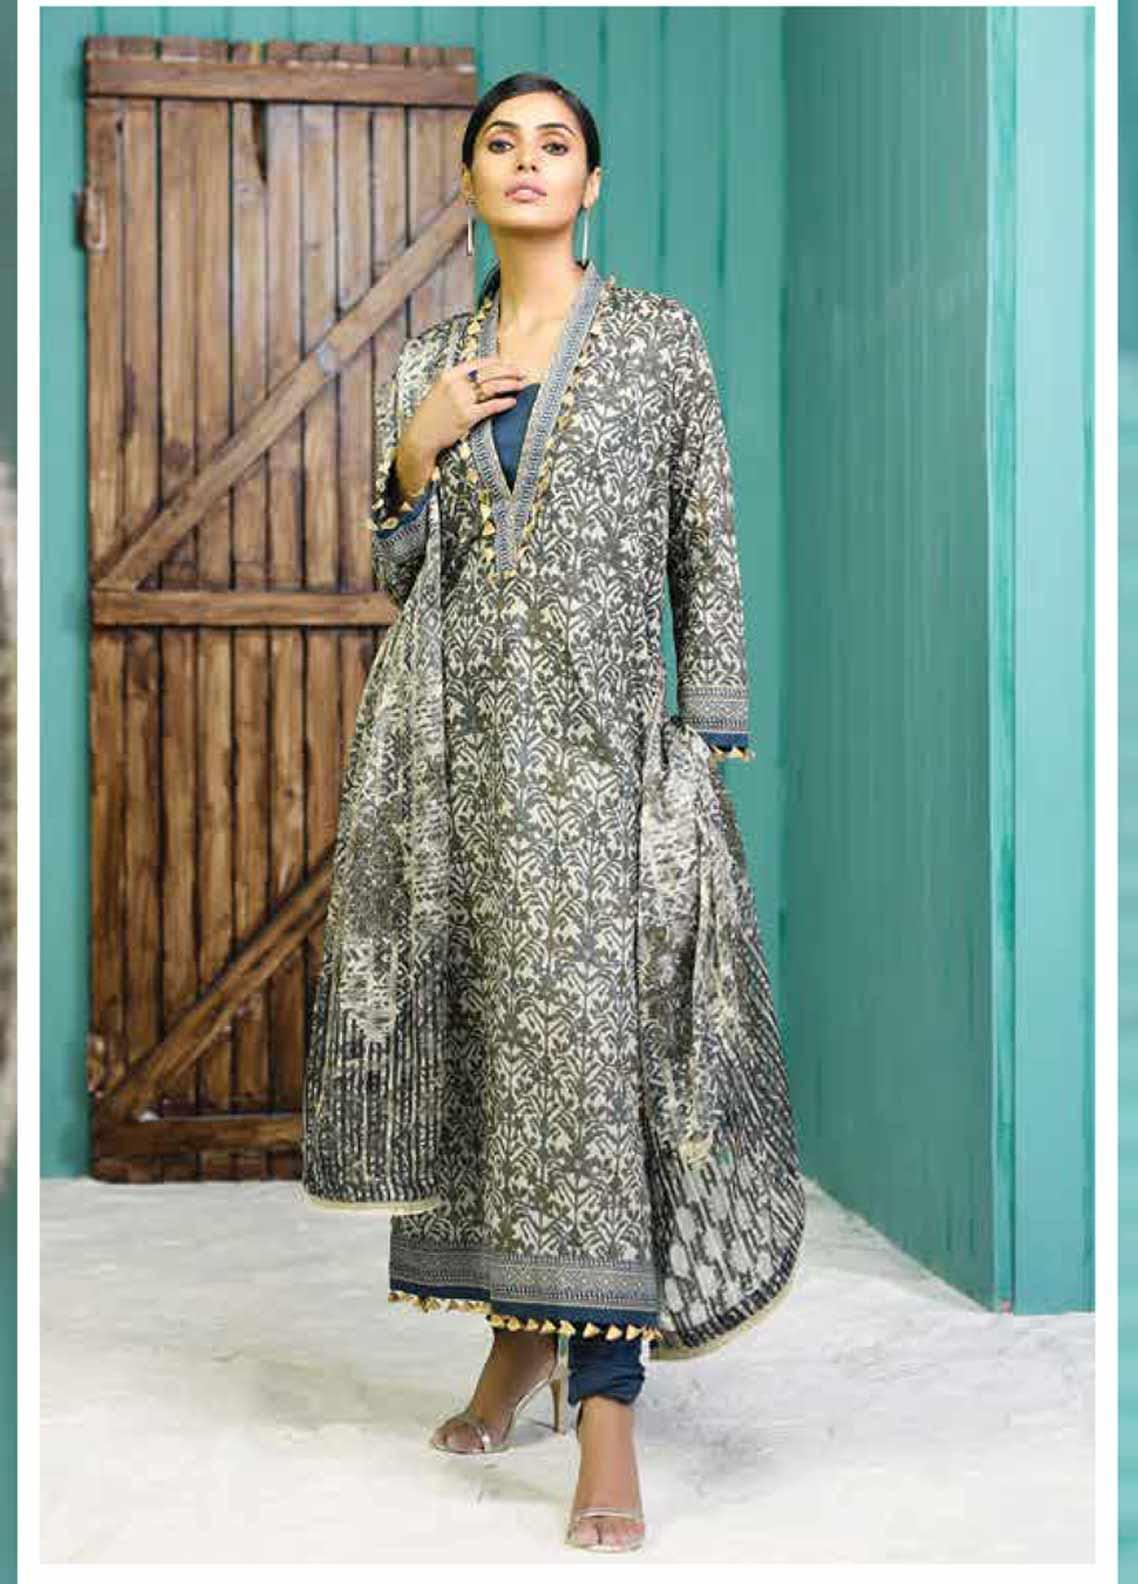 Al Karam Printed Lawn Unstitched 2 Piece Suit AK19-L2 11.1 GREEN - Spring / Summer Collection